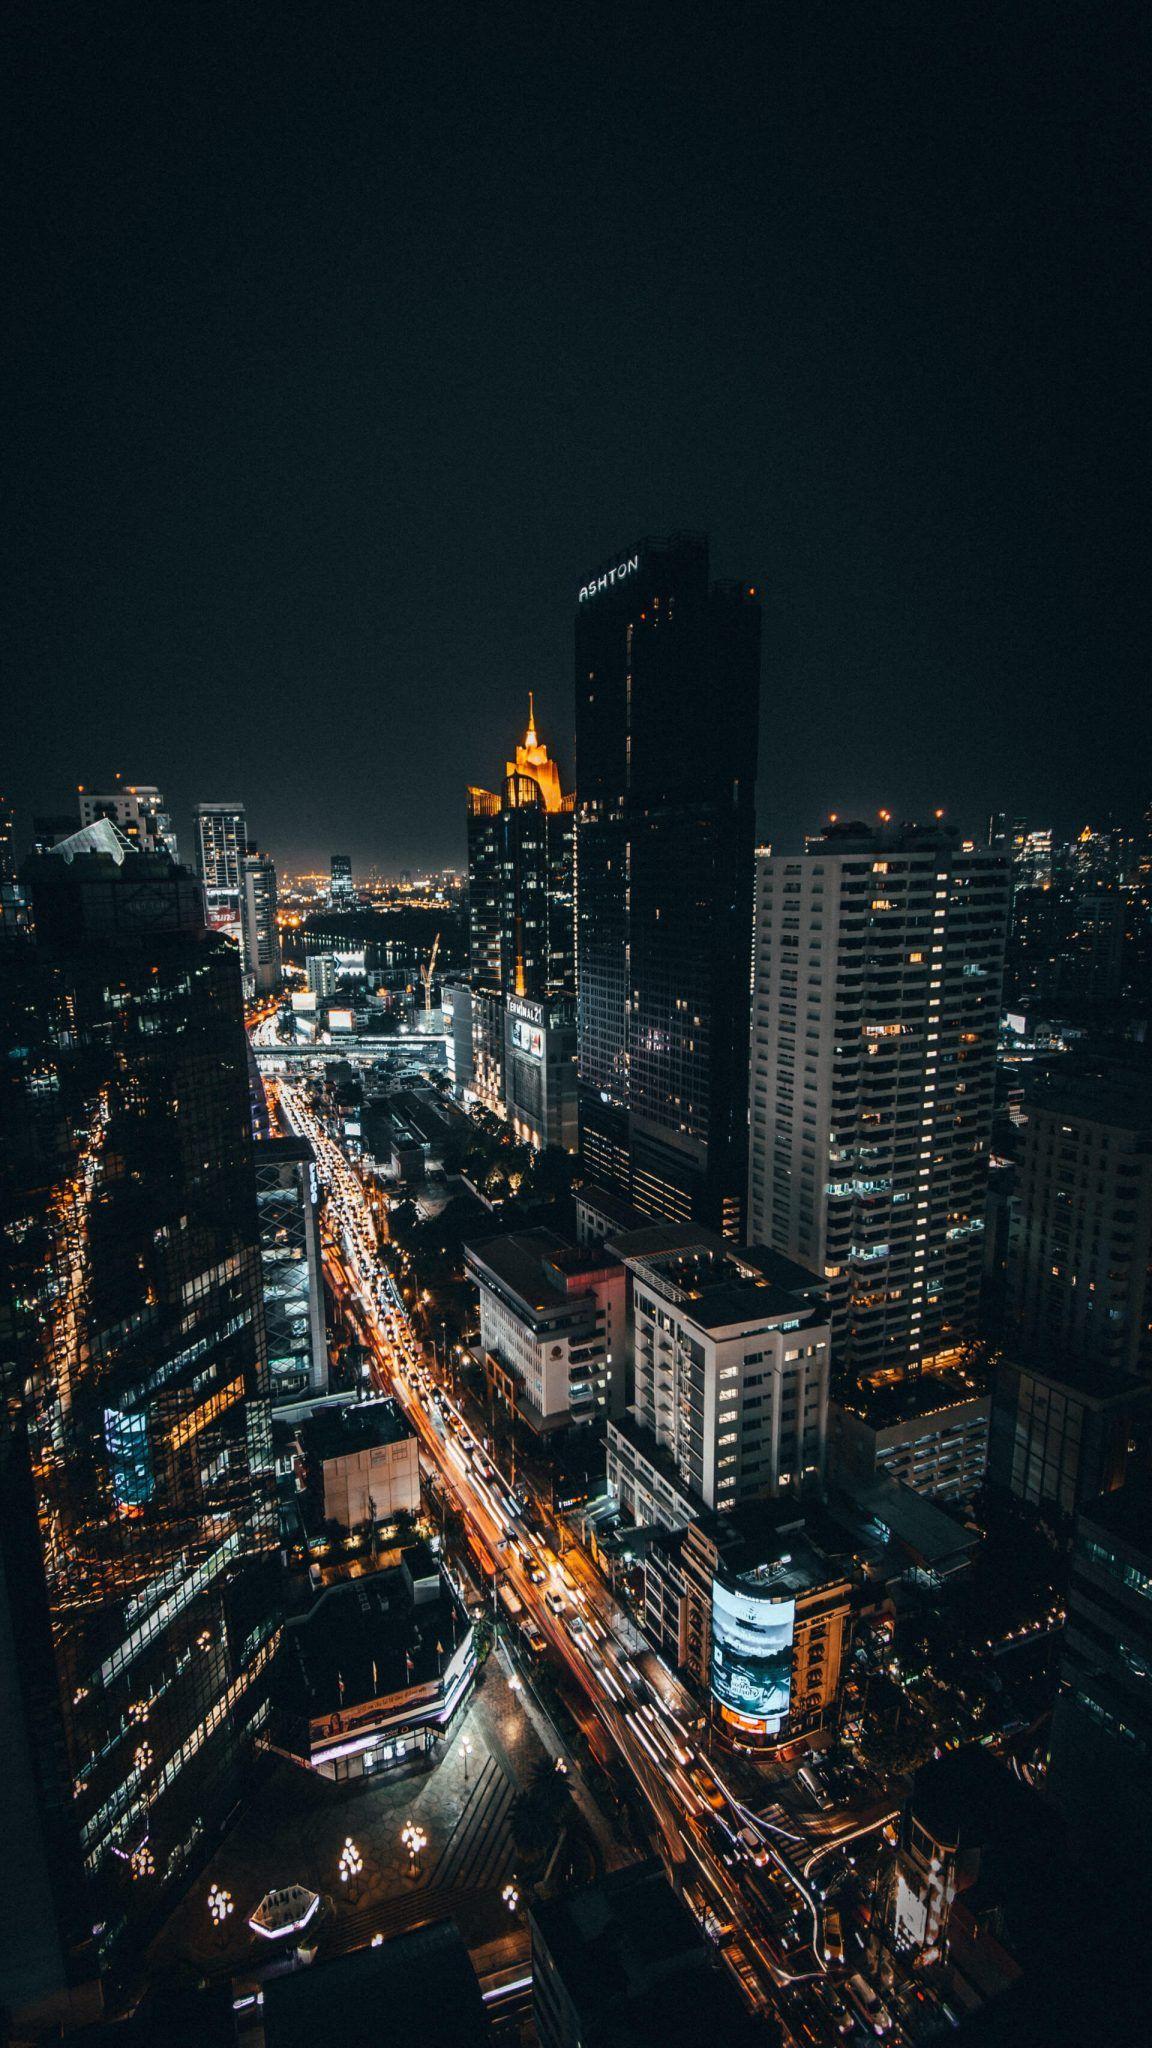 999 4k Hd Iphone Lockscreen Background Wallpaper City Wallpaper City Lights Wallpaper Urban Landscape